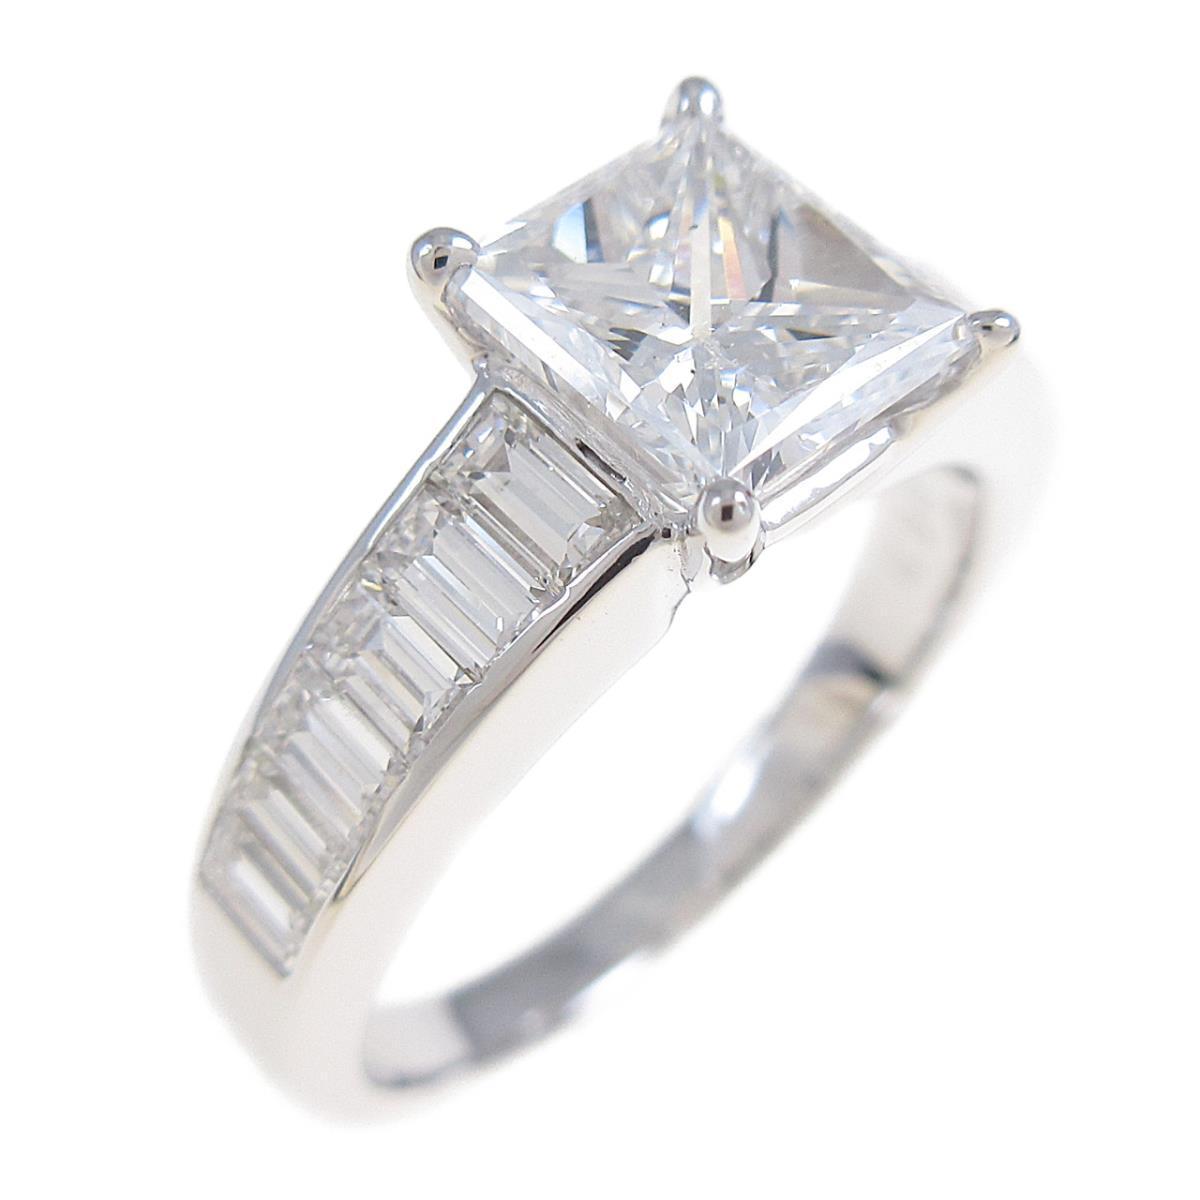 K18WG ダイヤモンドリング 1.202ct・E・SI2・プリンセスカット【中古】